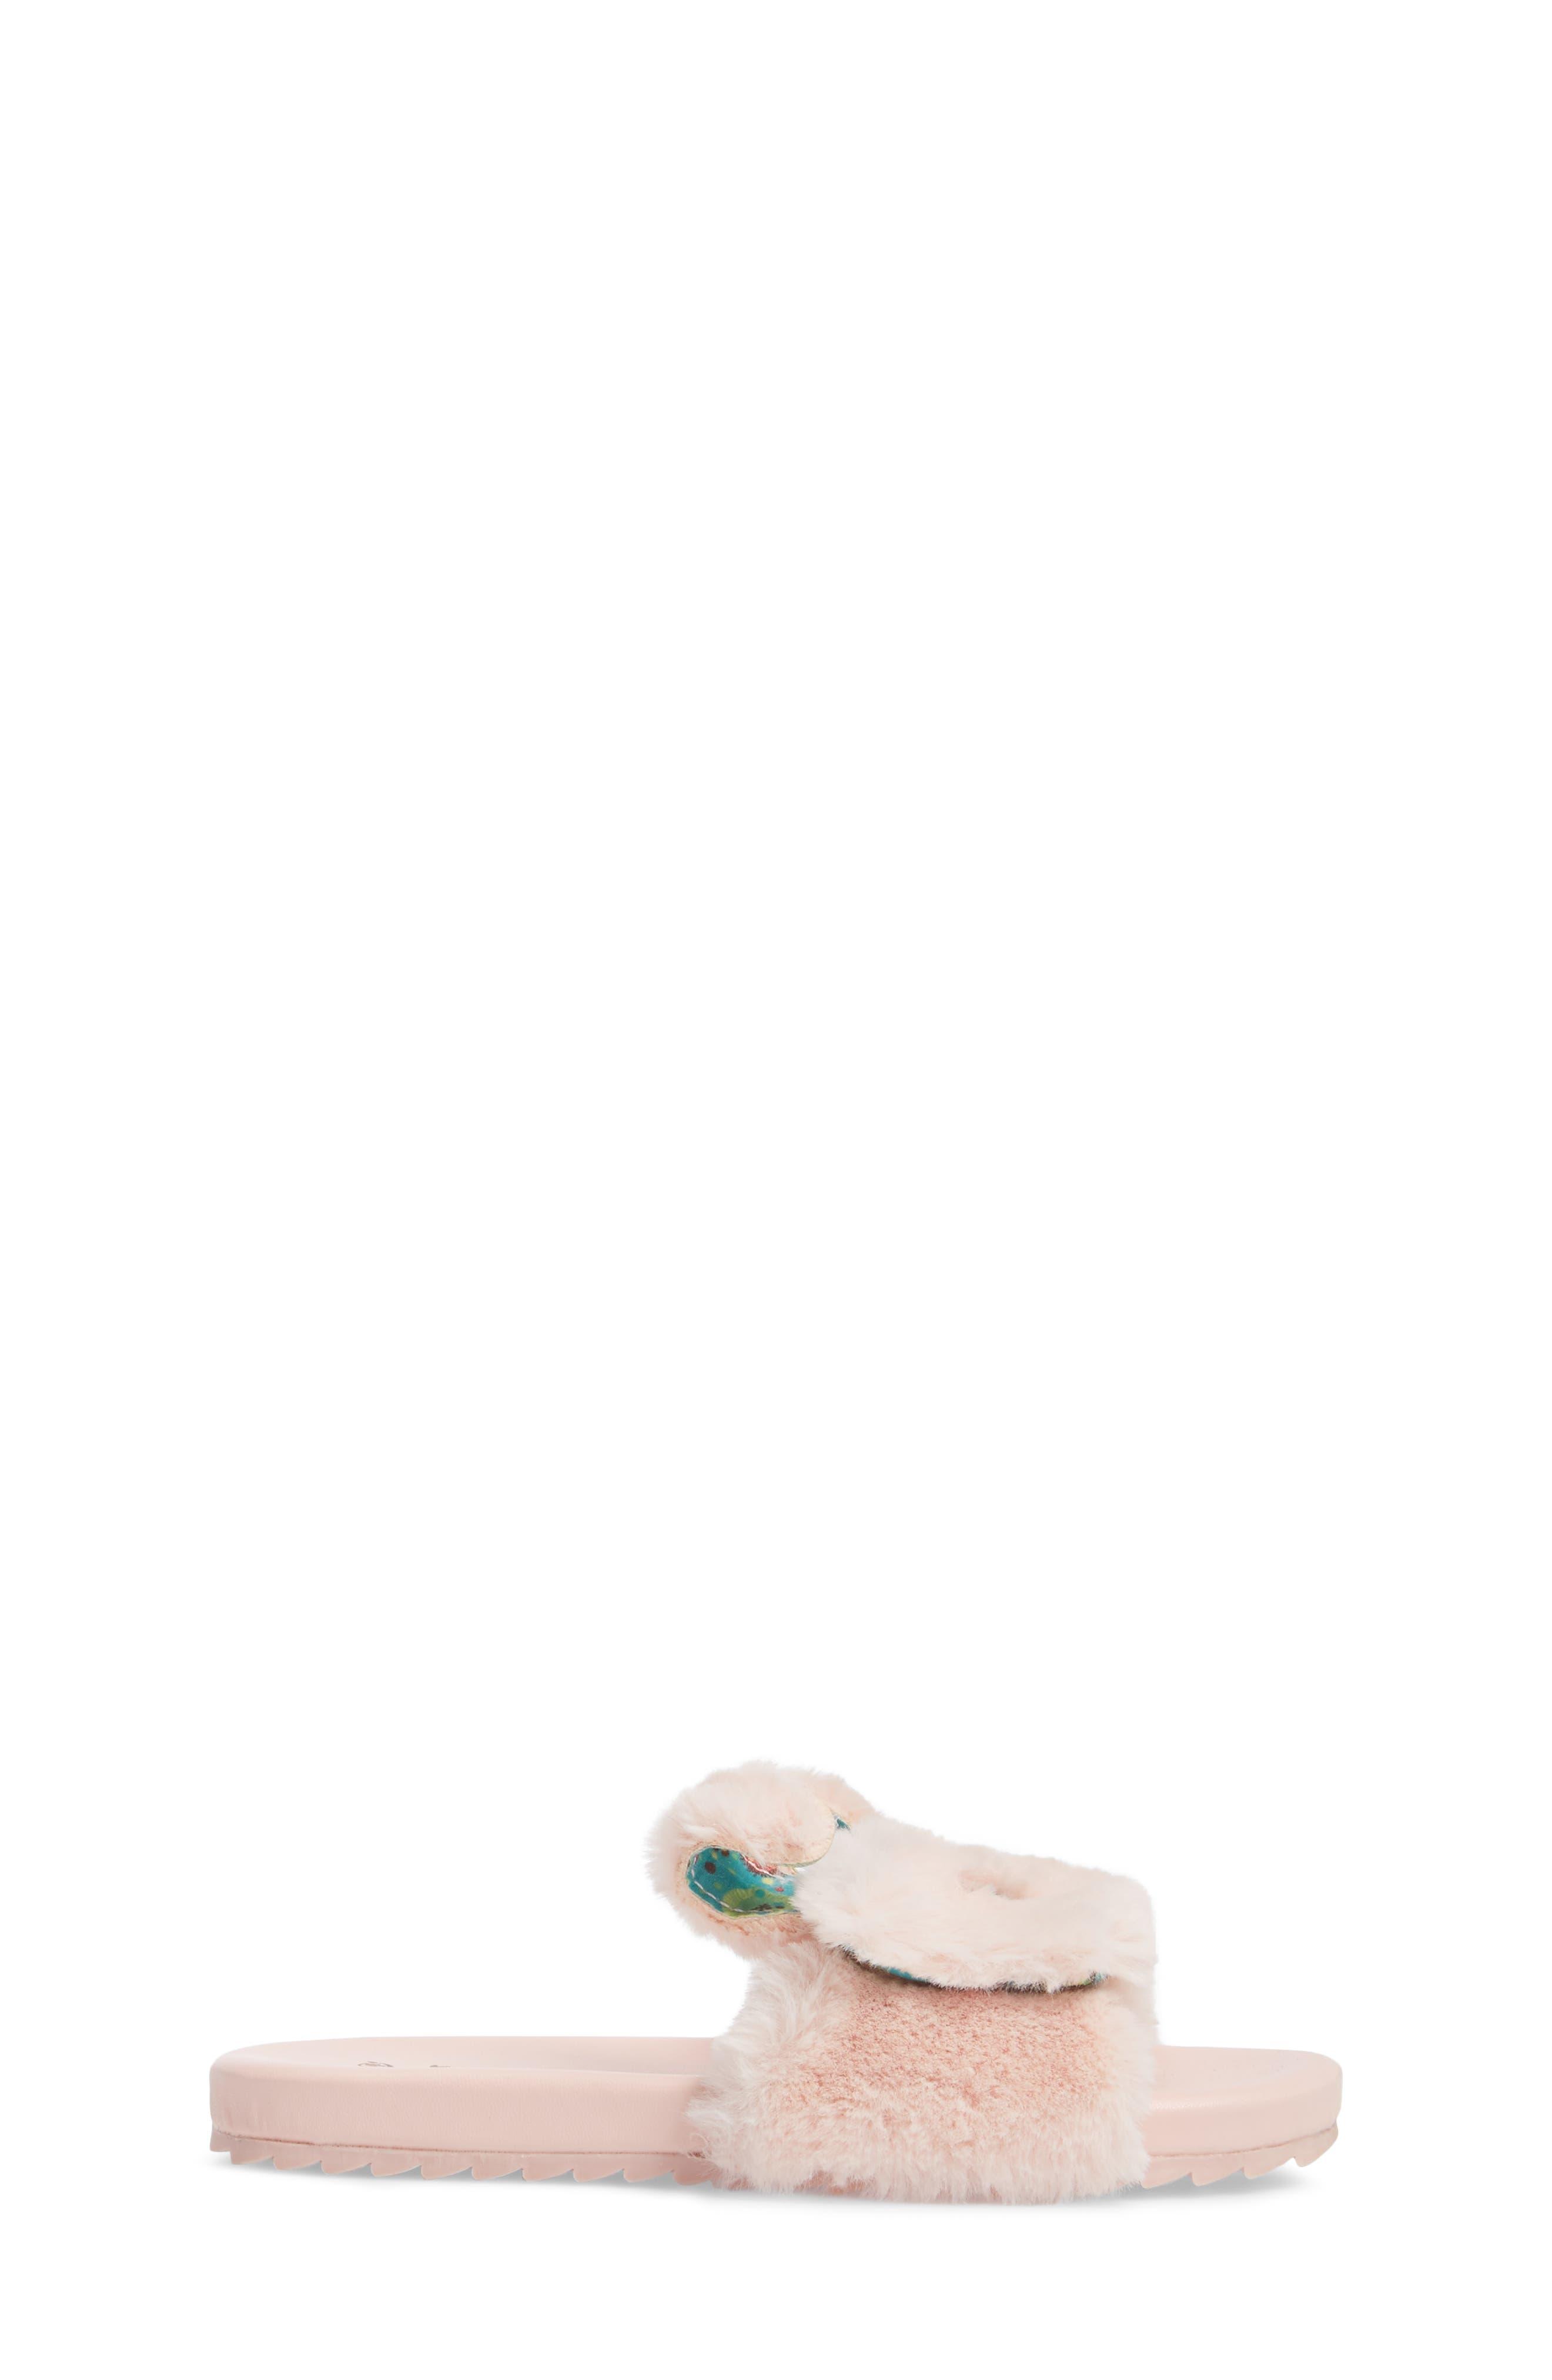 Willa Carrot Faux Fur Slide Sandal,                             Alternate thumbnail 3, color,                             650